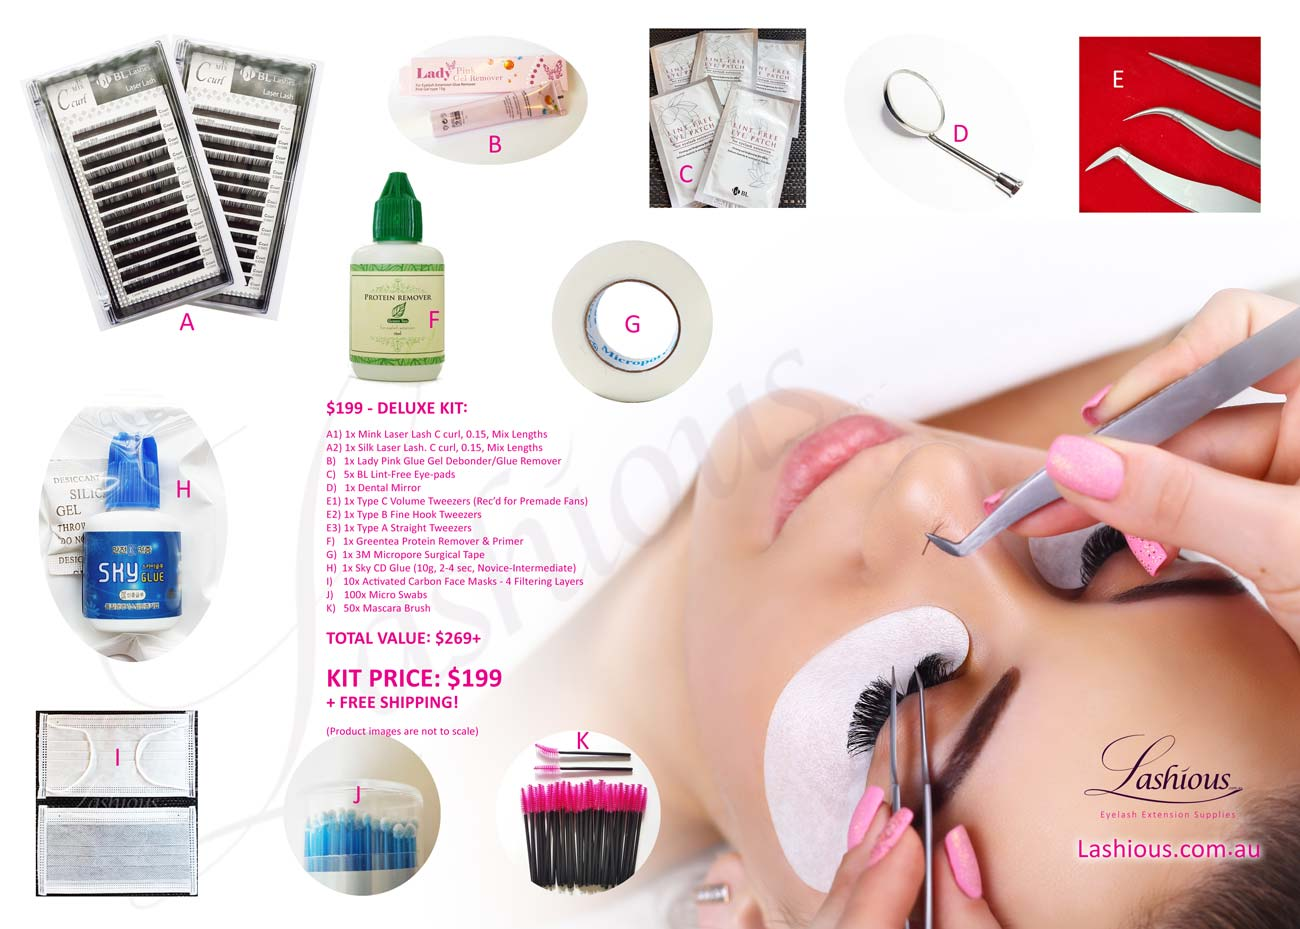 c06d3b1ac5c Eyelash Extensions Kit - Lashious Australia